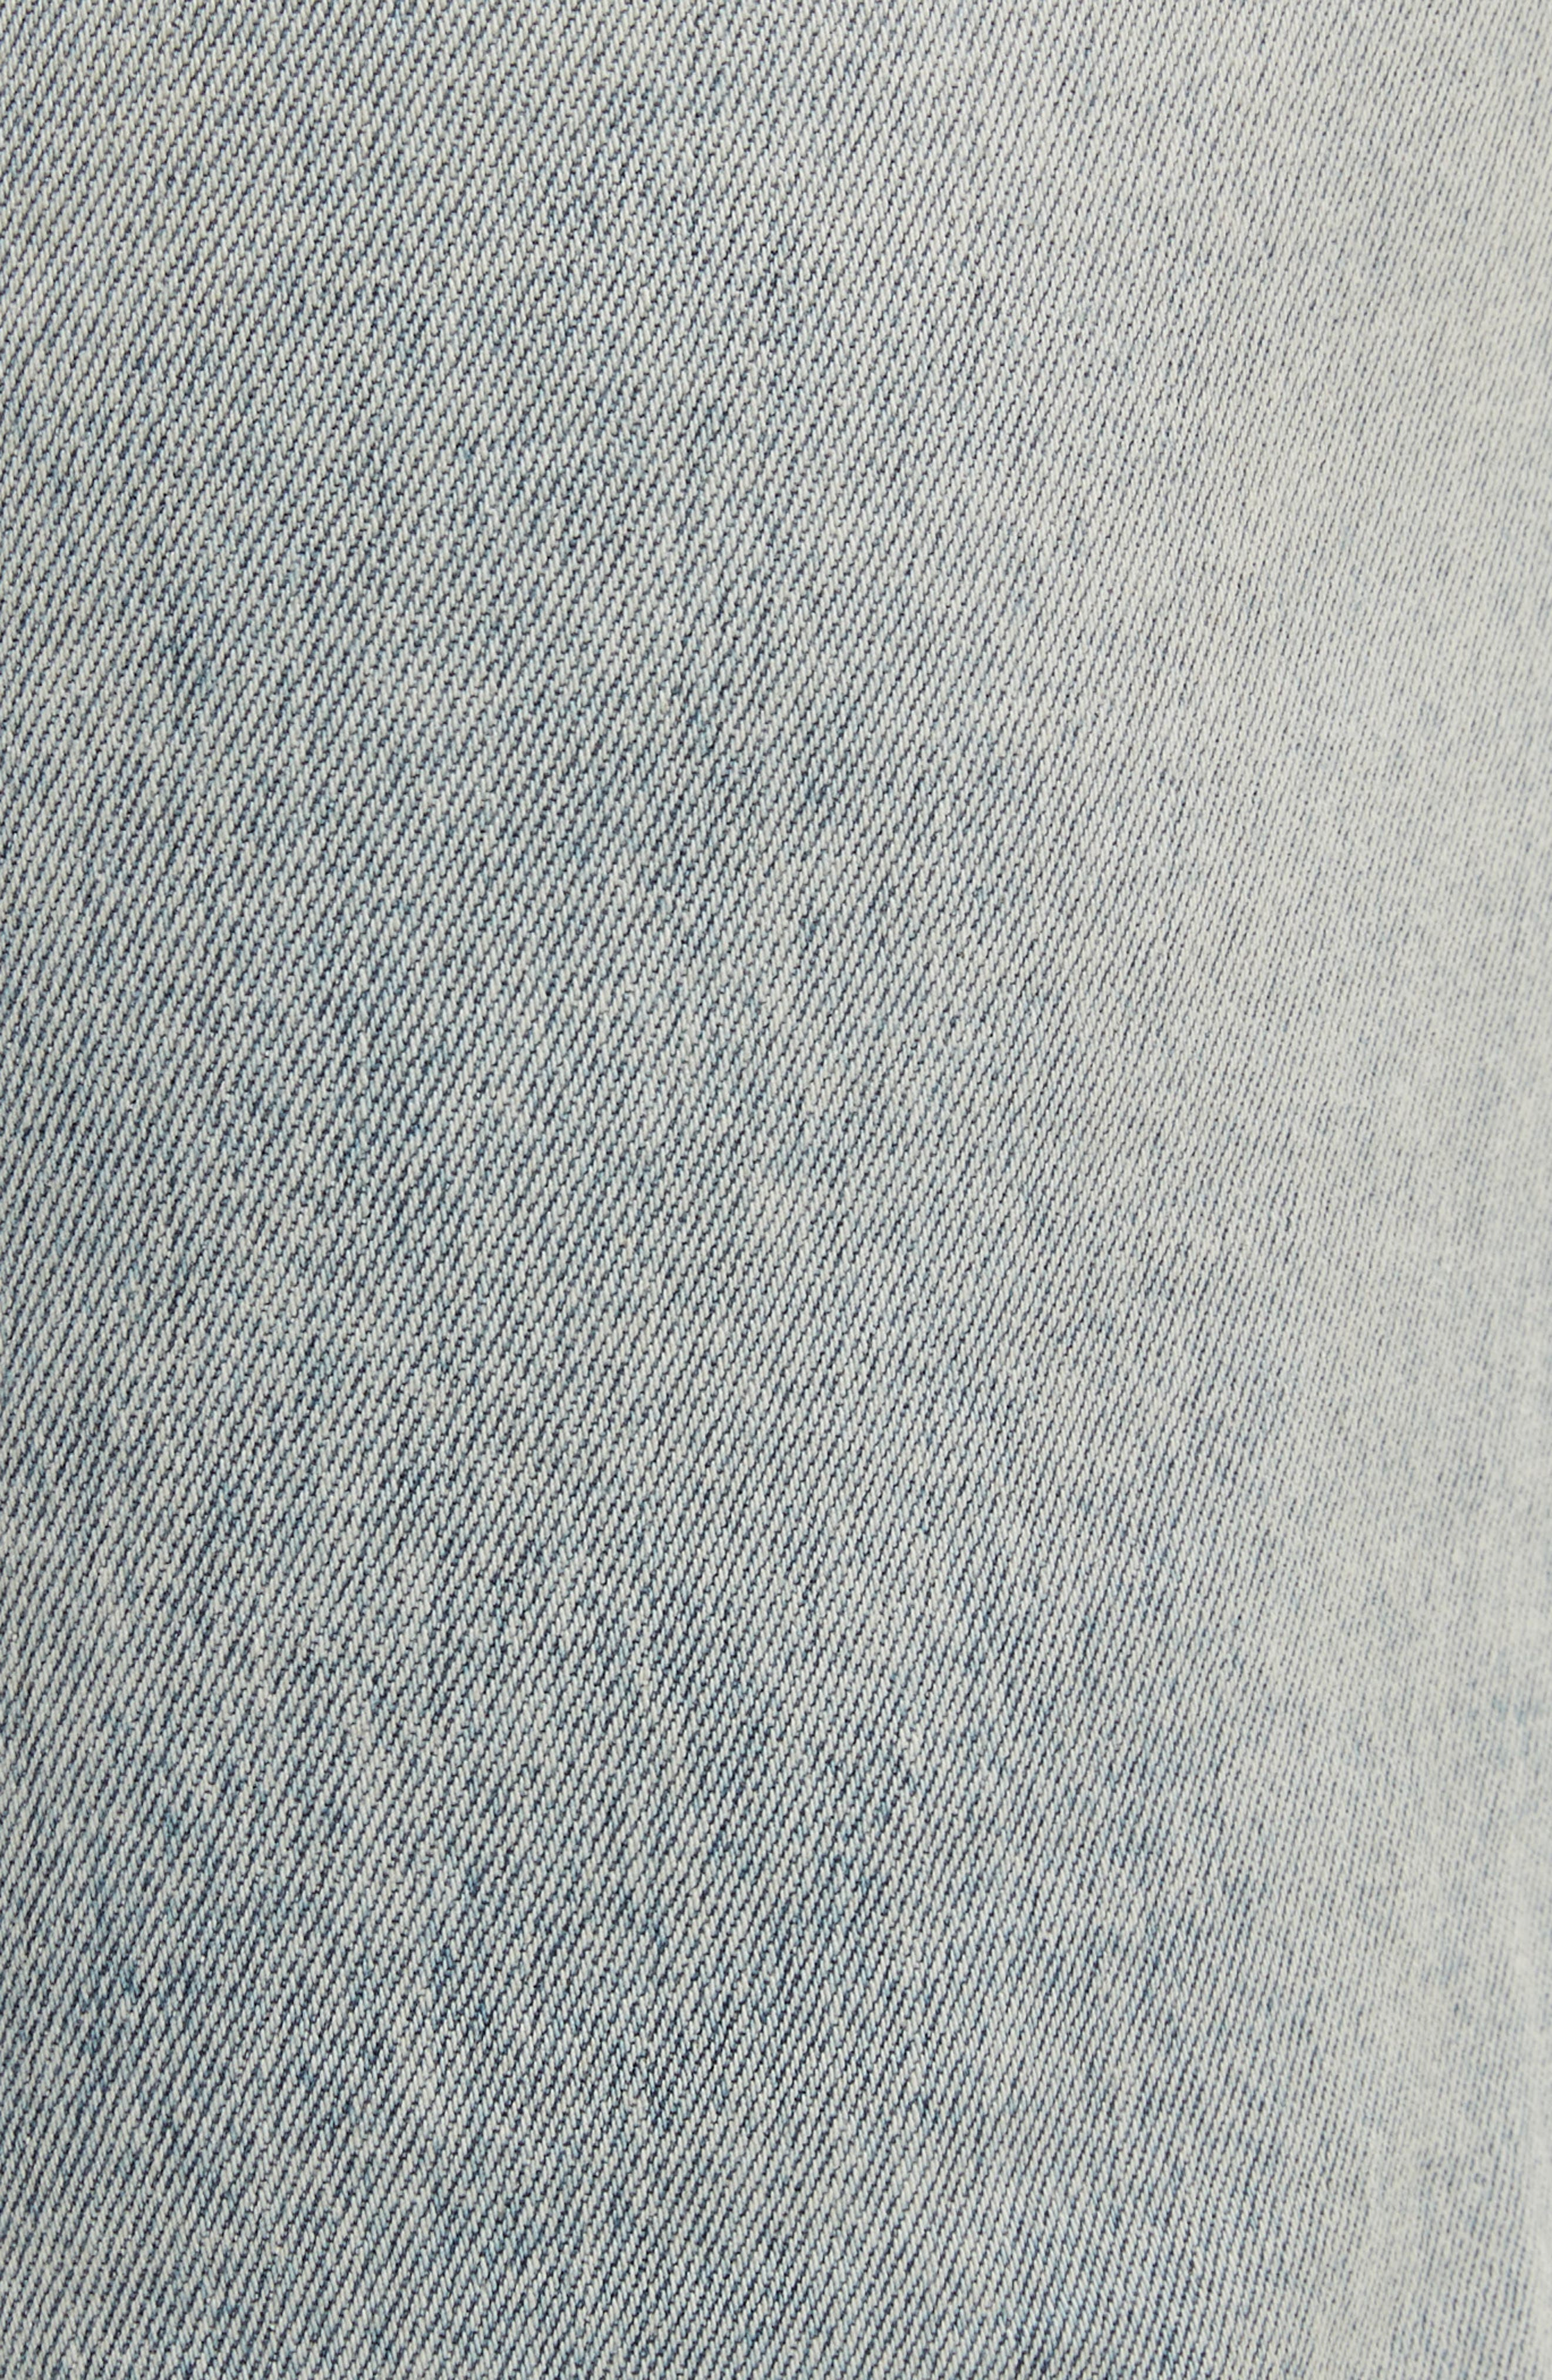 Skate Destroyed Jeans,                             Alternate thumbnail 5, color,                             460